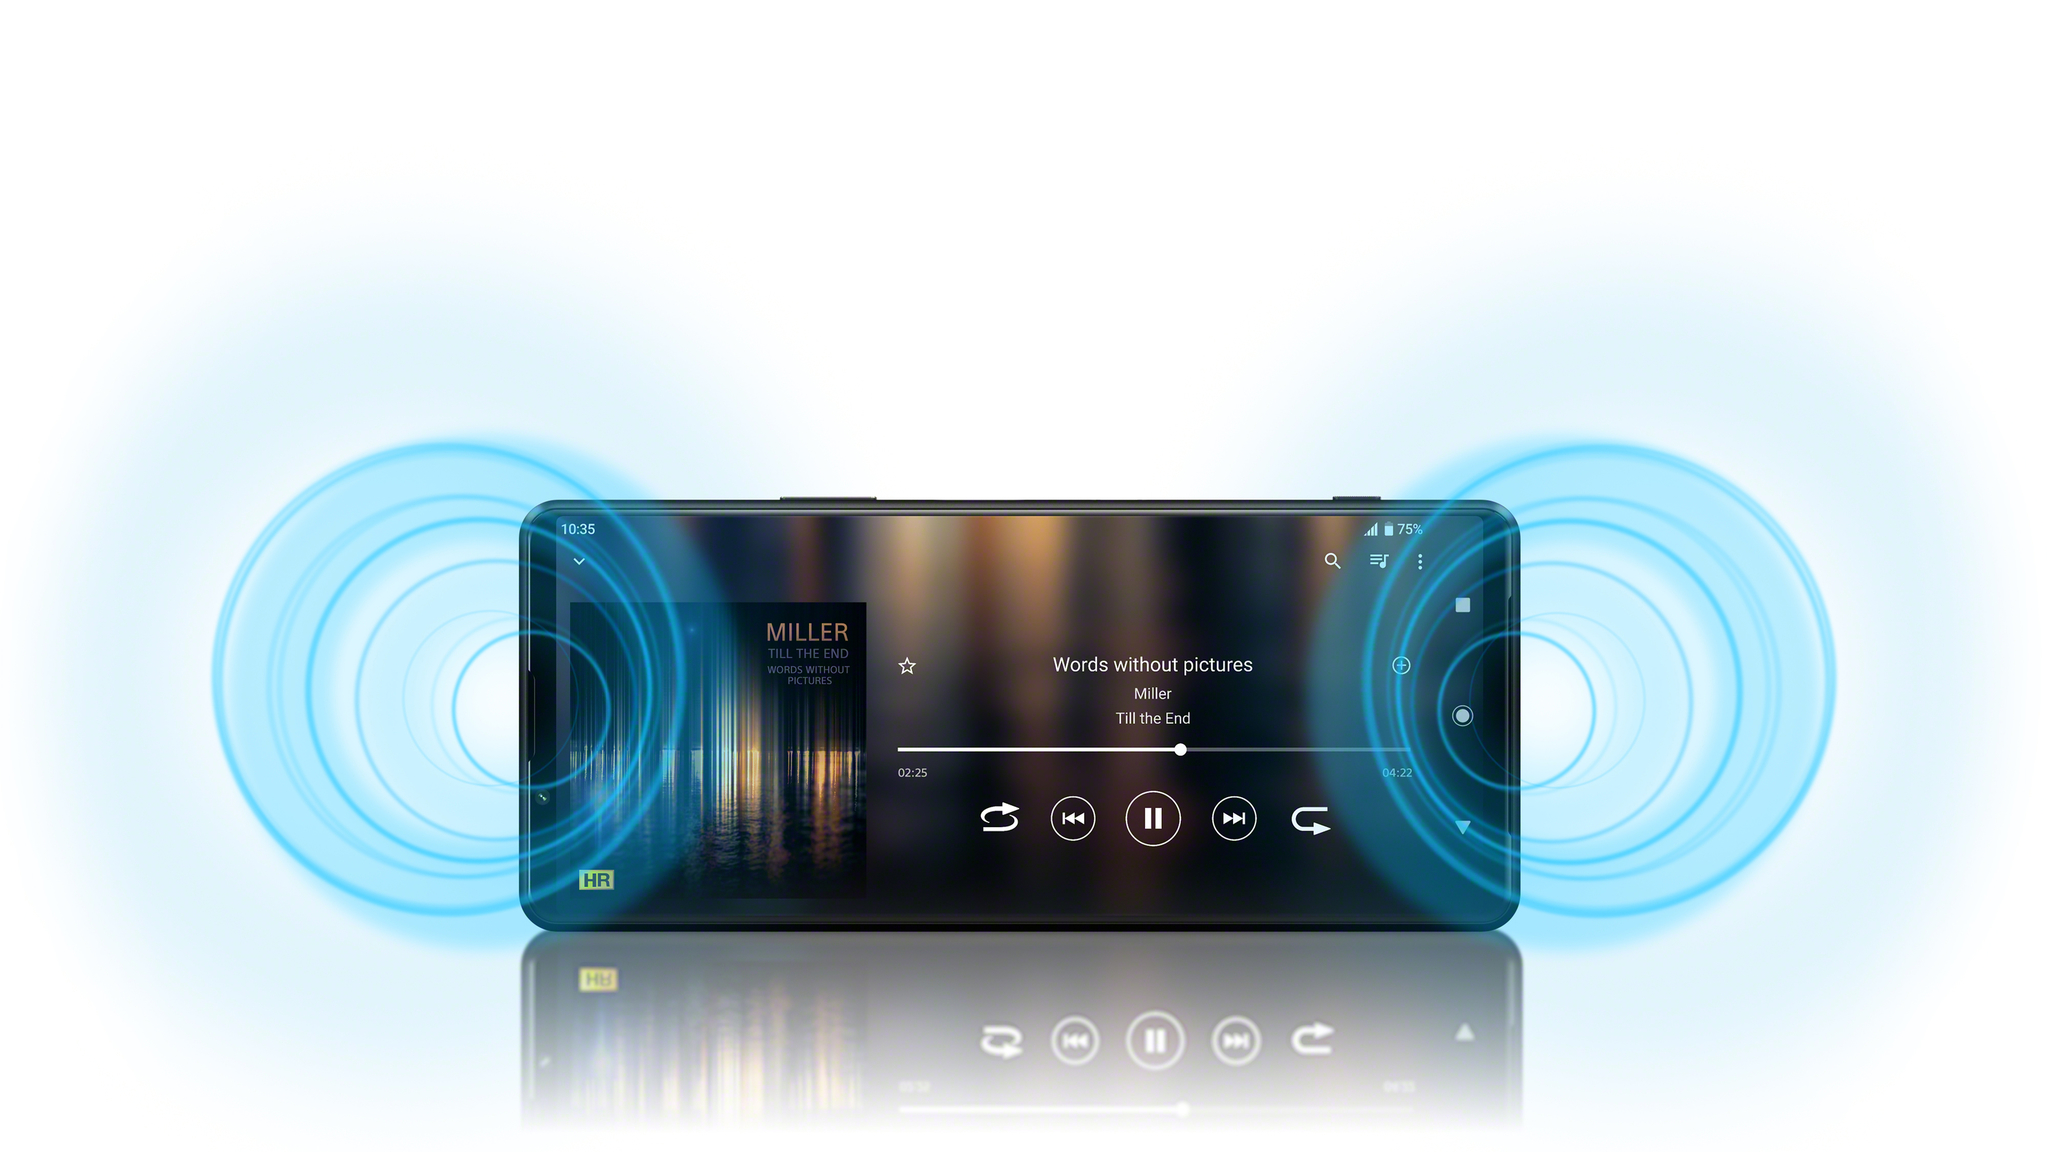 Слушайте вашу любимую музыку на смартфоне Xperia 1 III в наушниках и без